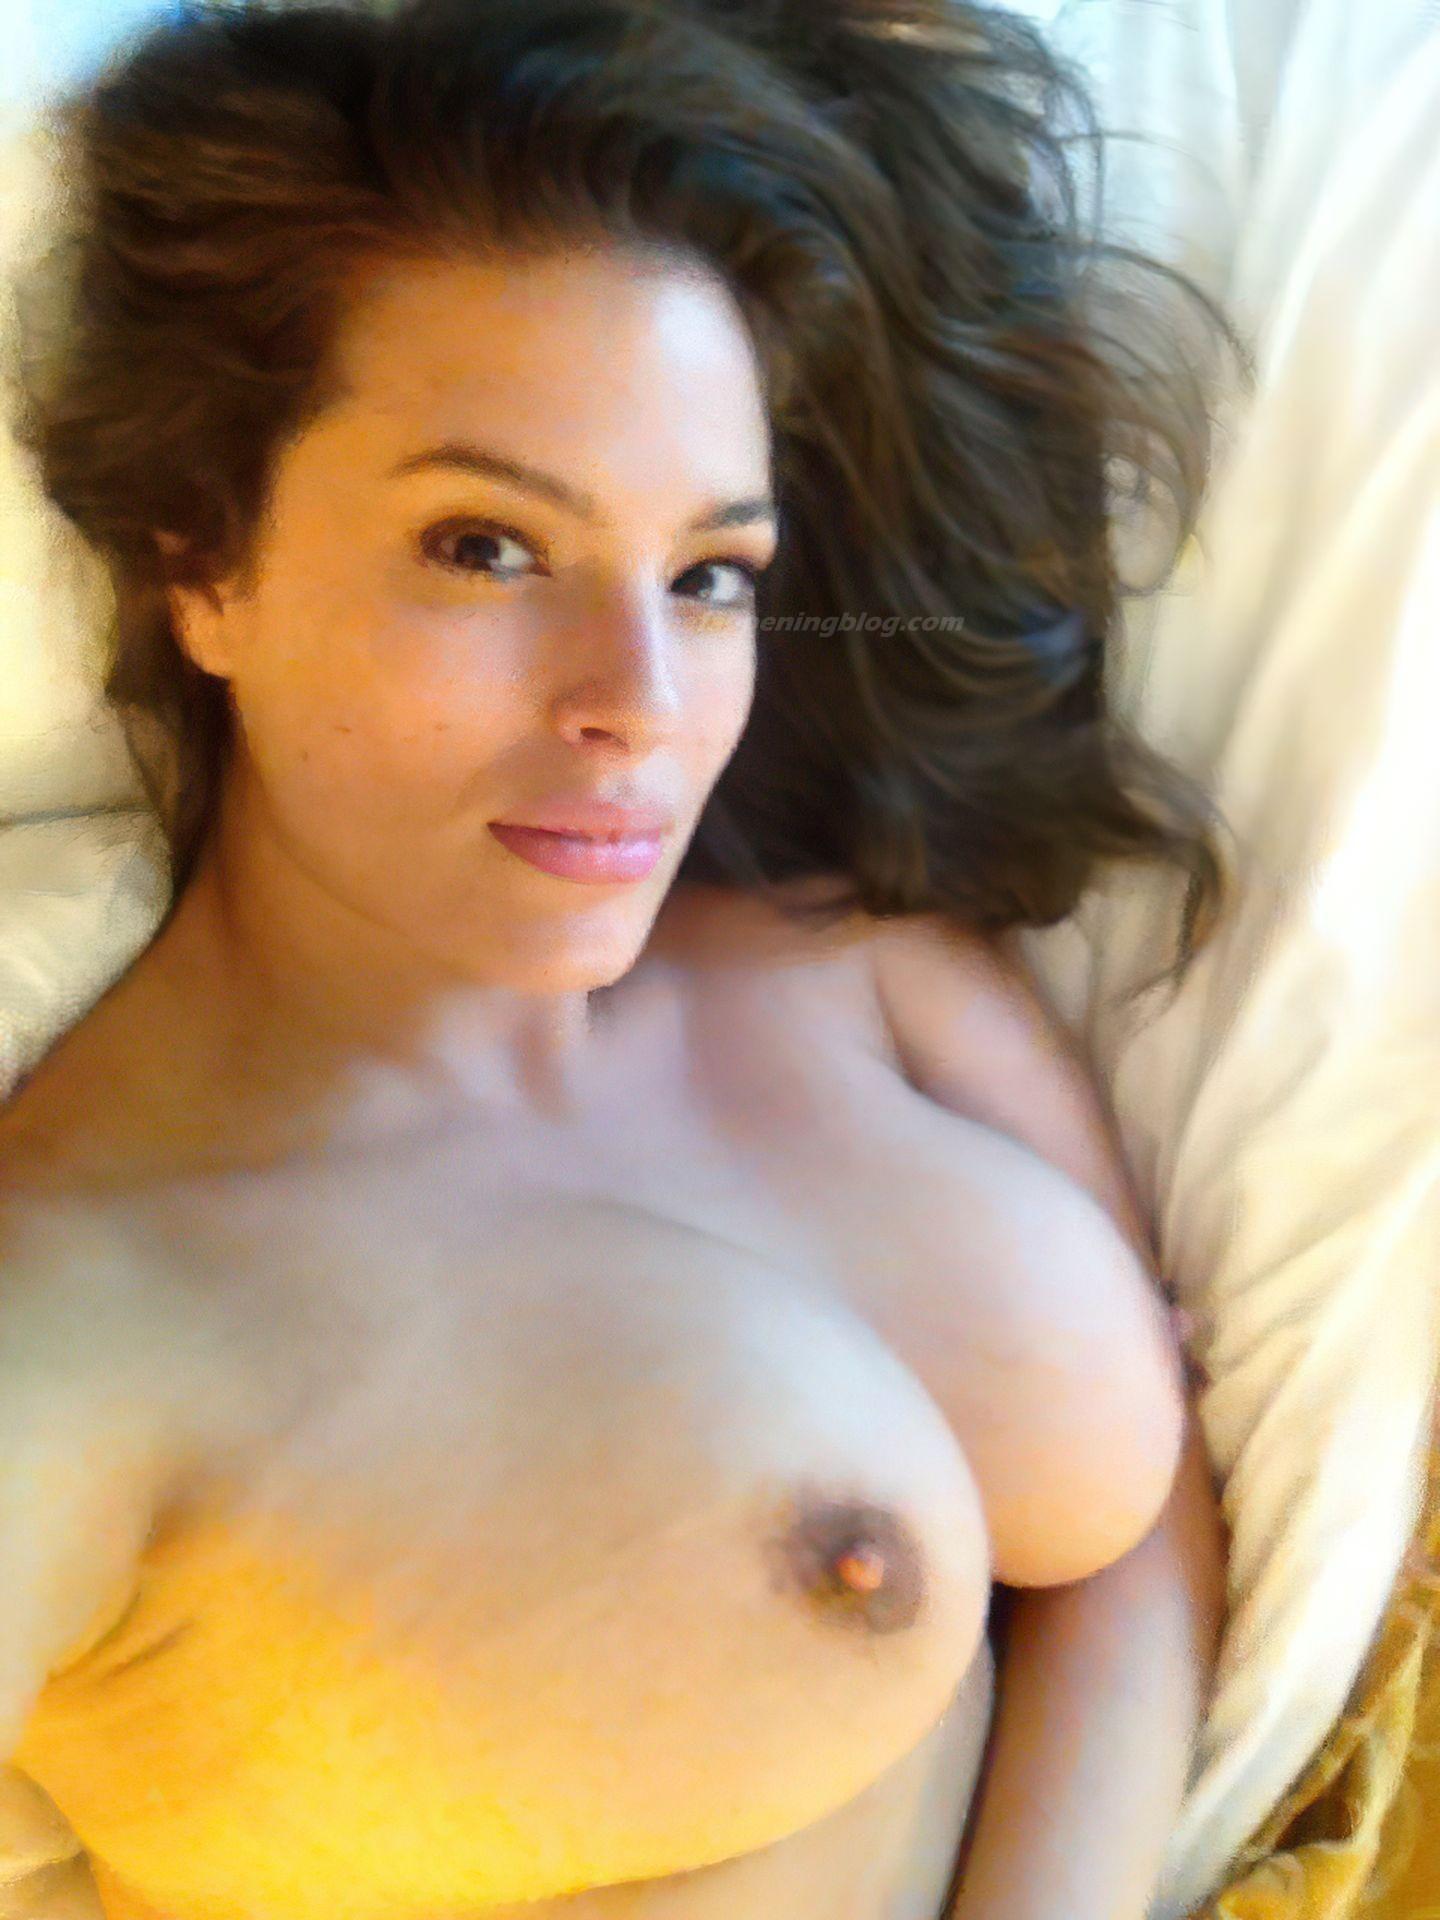 Ashley-Graham-Nude-Leaked-37-thefappenin